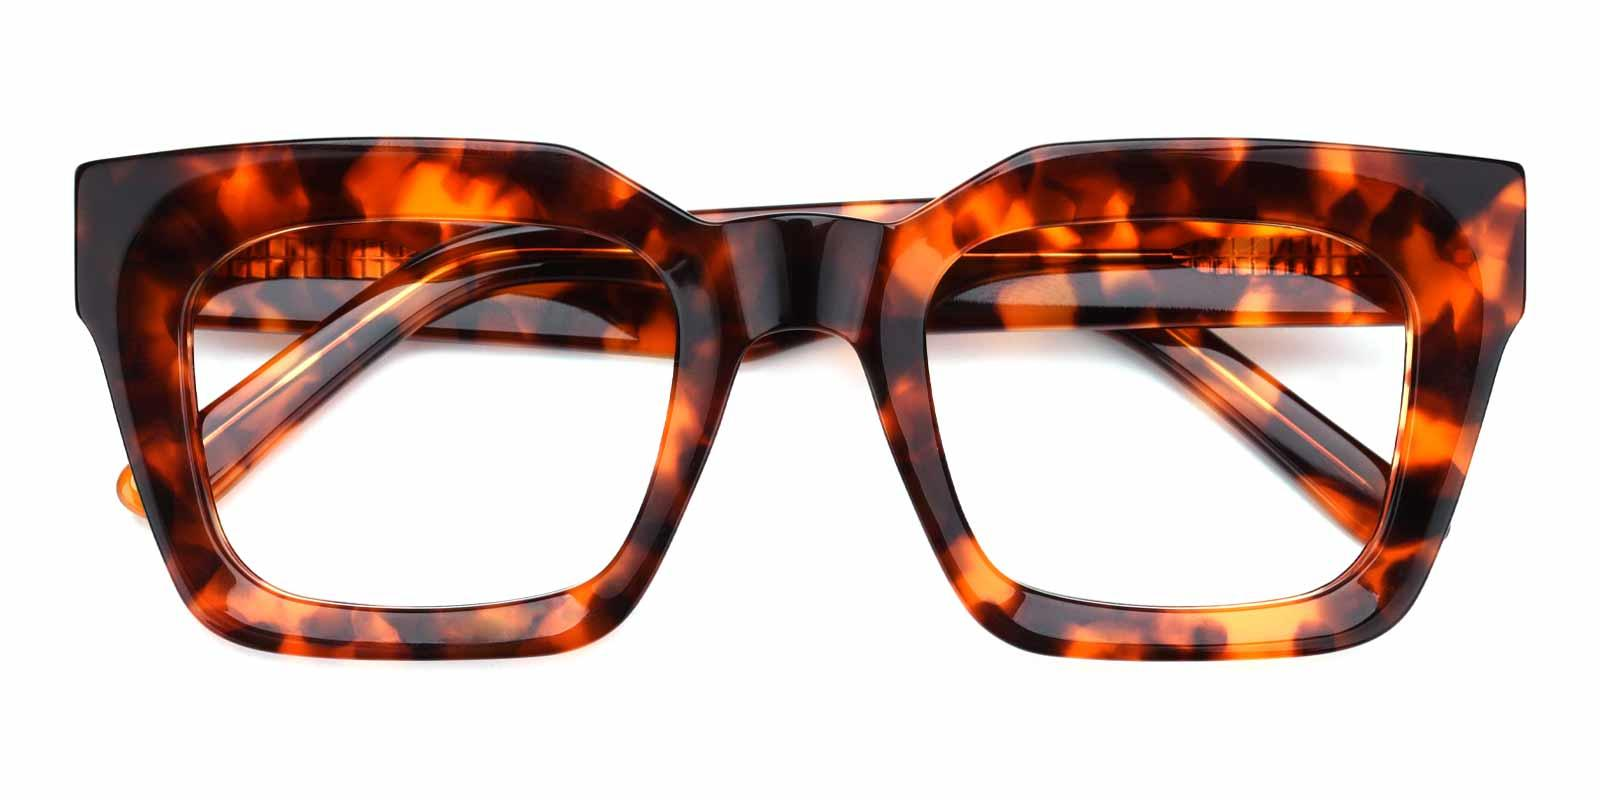 Esther-Tortoise-Geometric-Acetate-Eyeglasses-detail